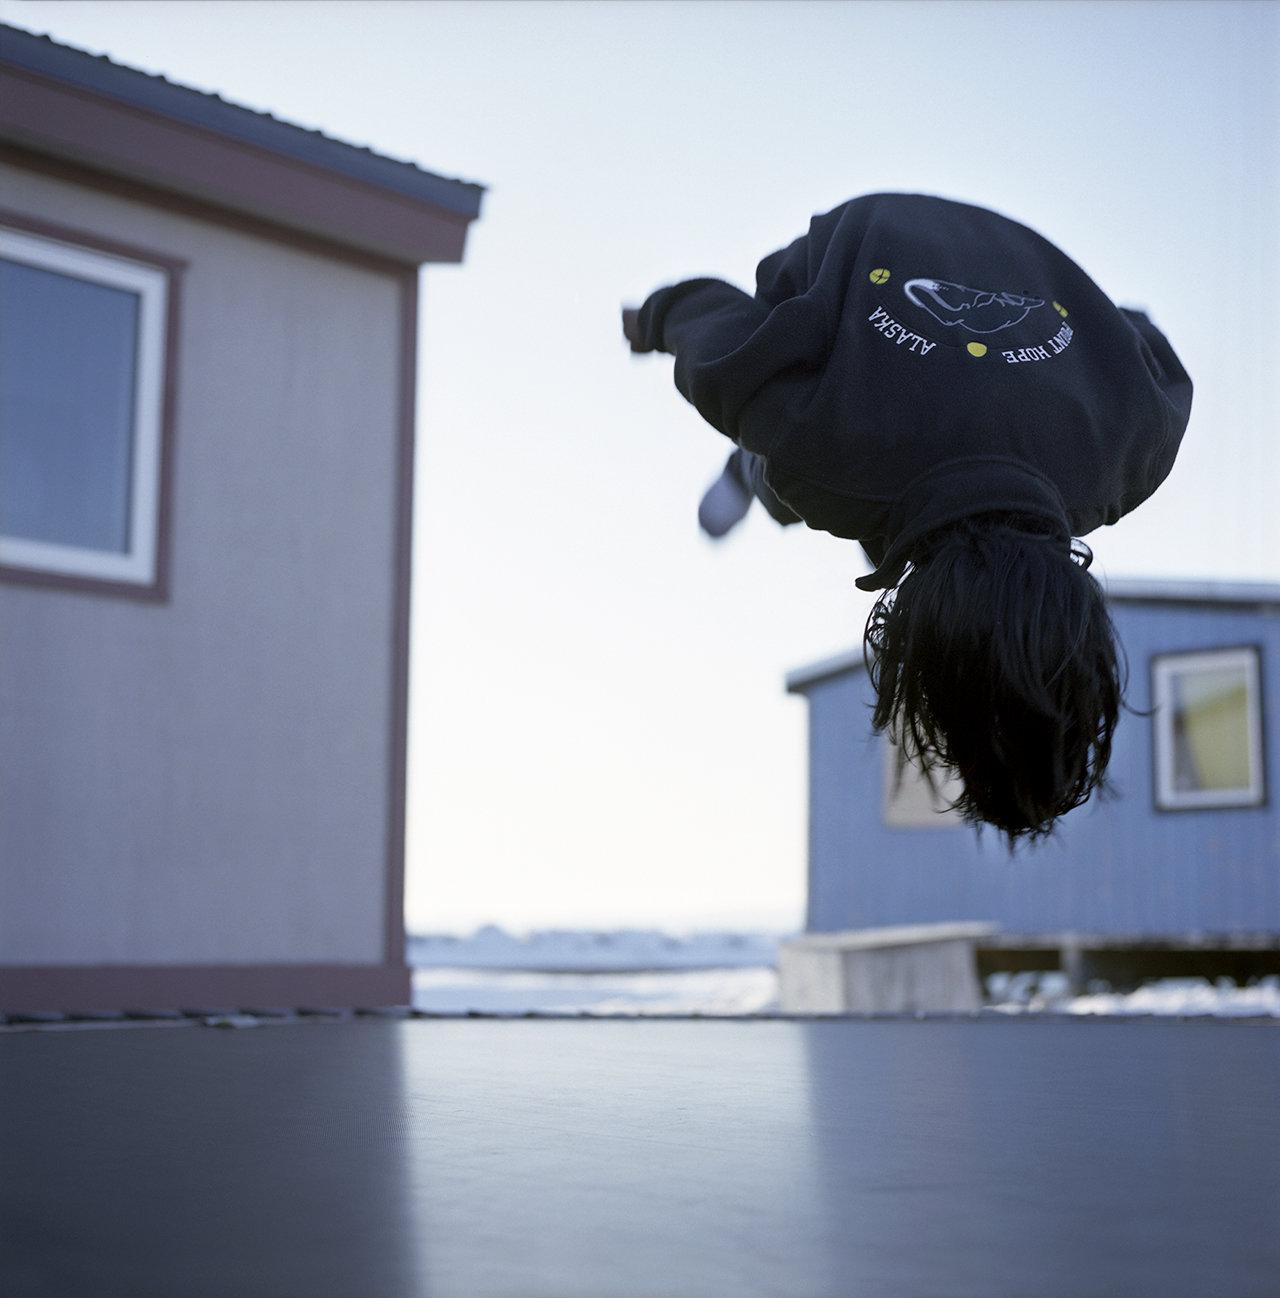 Back flip on the trampoline, 2009